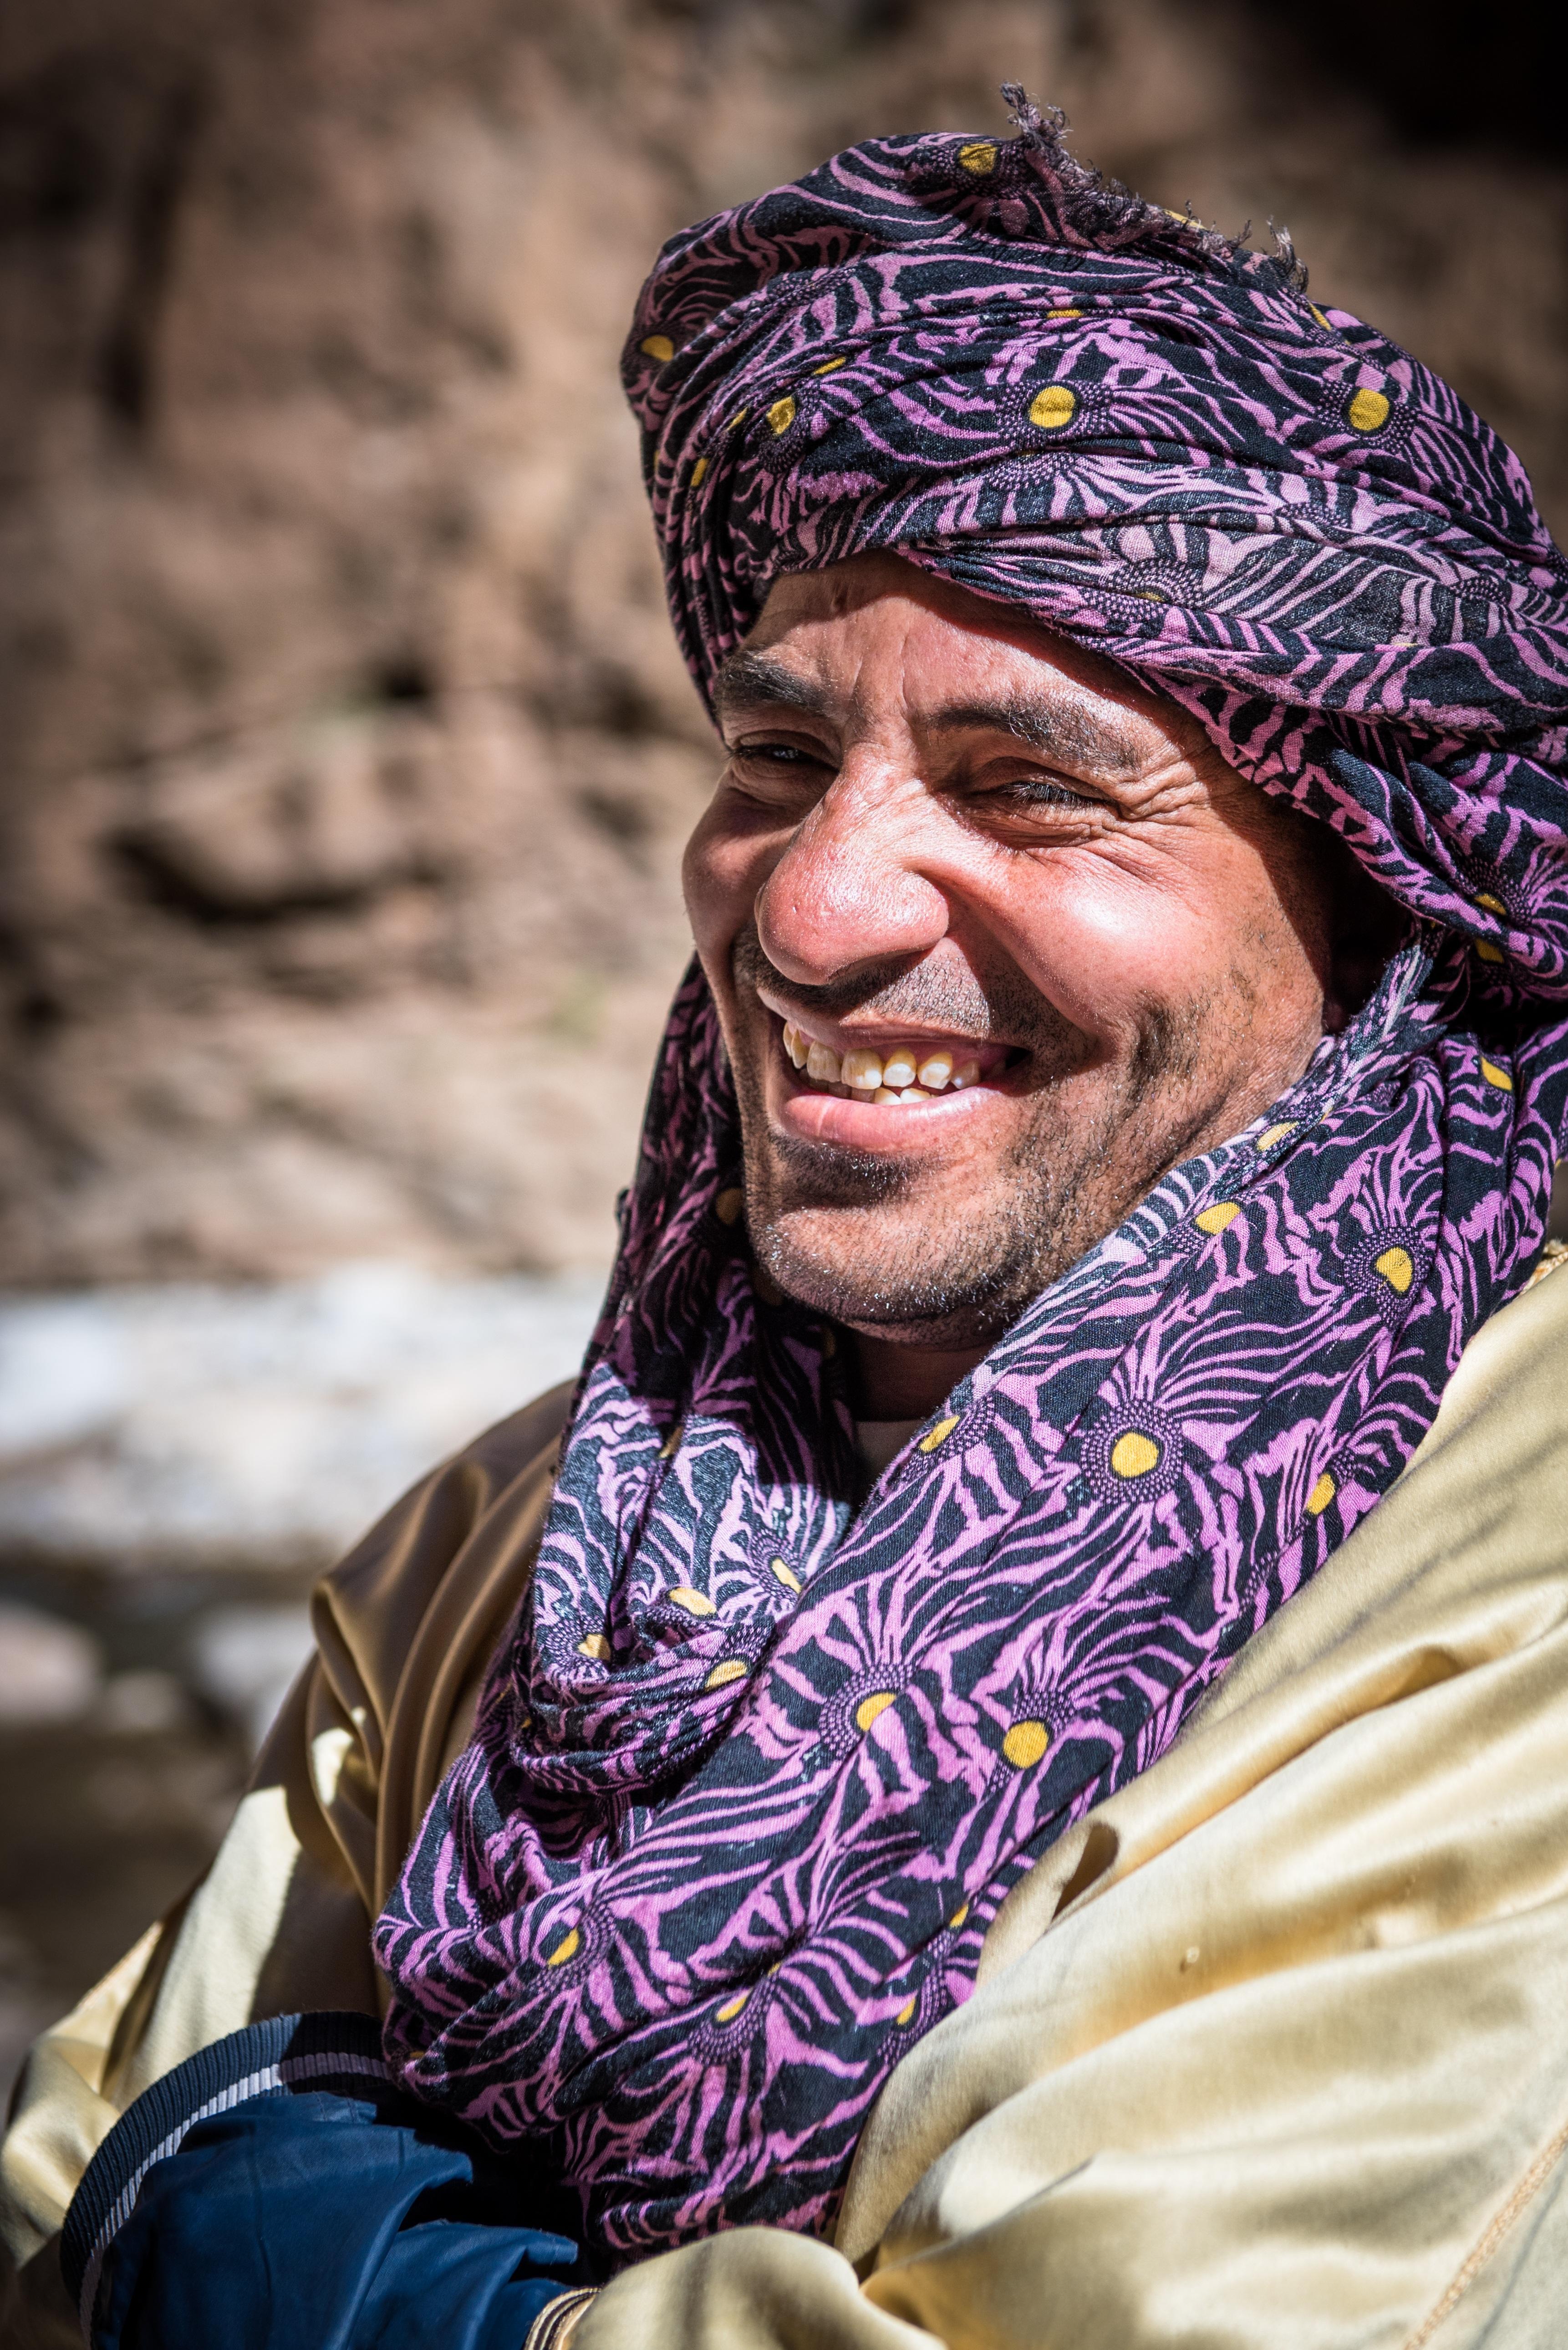 лето марокканцы фото мужчин облике